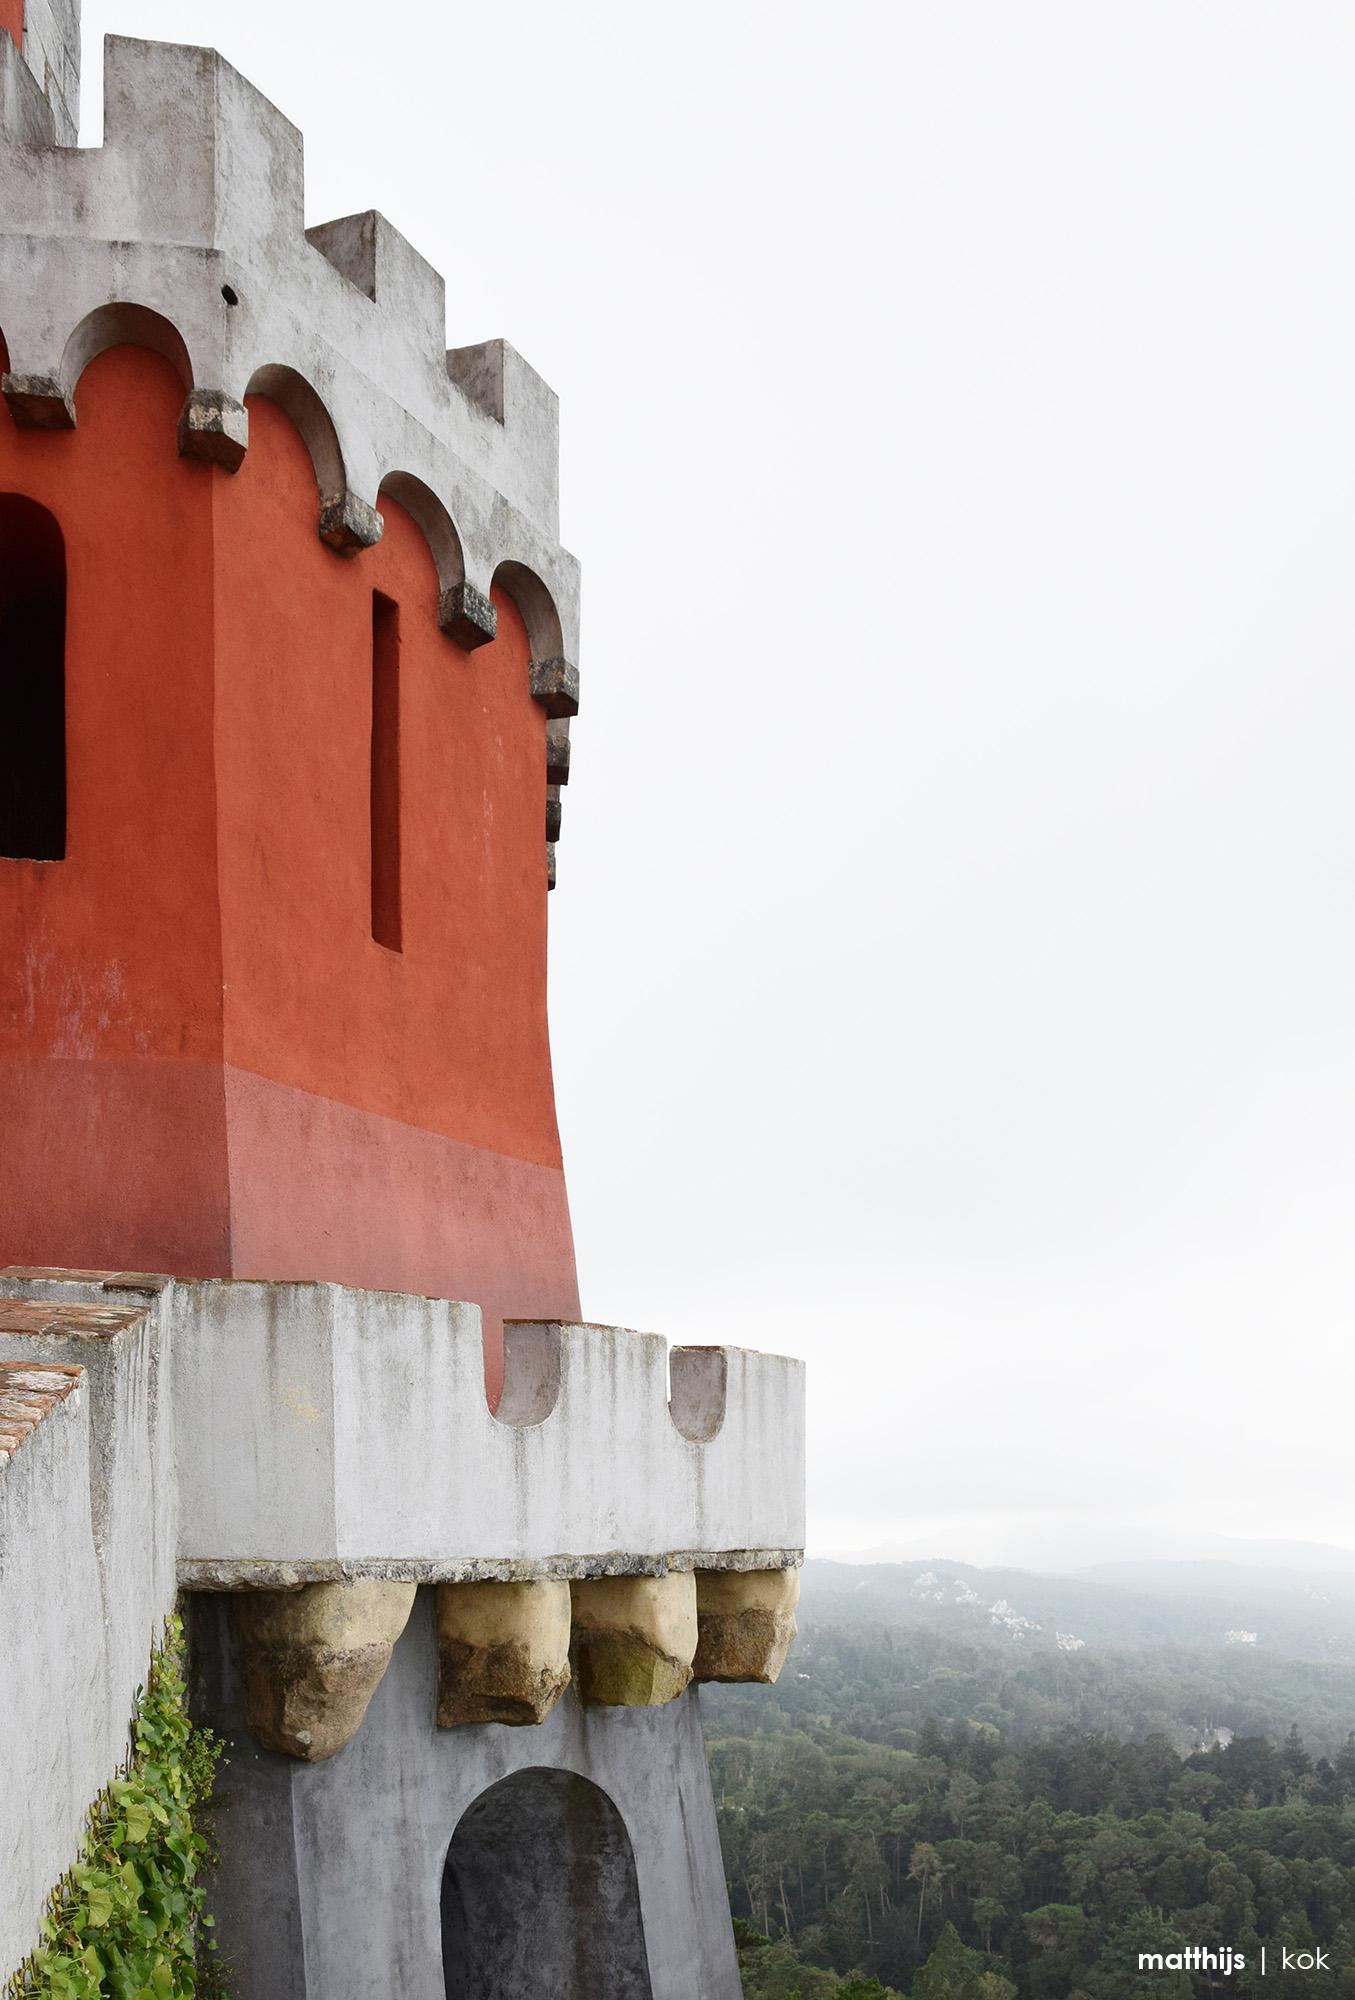 Palacio Nacional da Pena, Pena Palace, Sintra, Portugal | Photo by Matthijs Kok